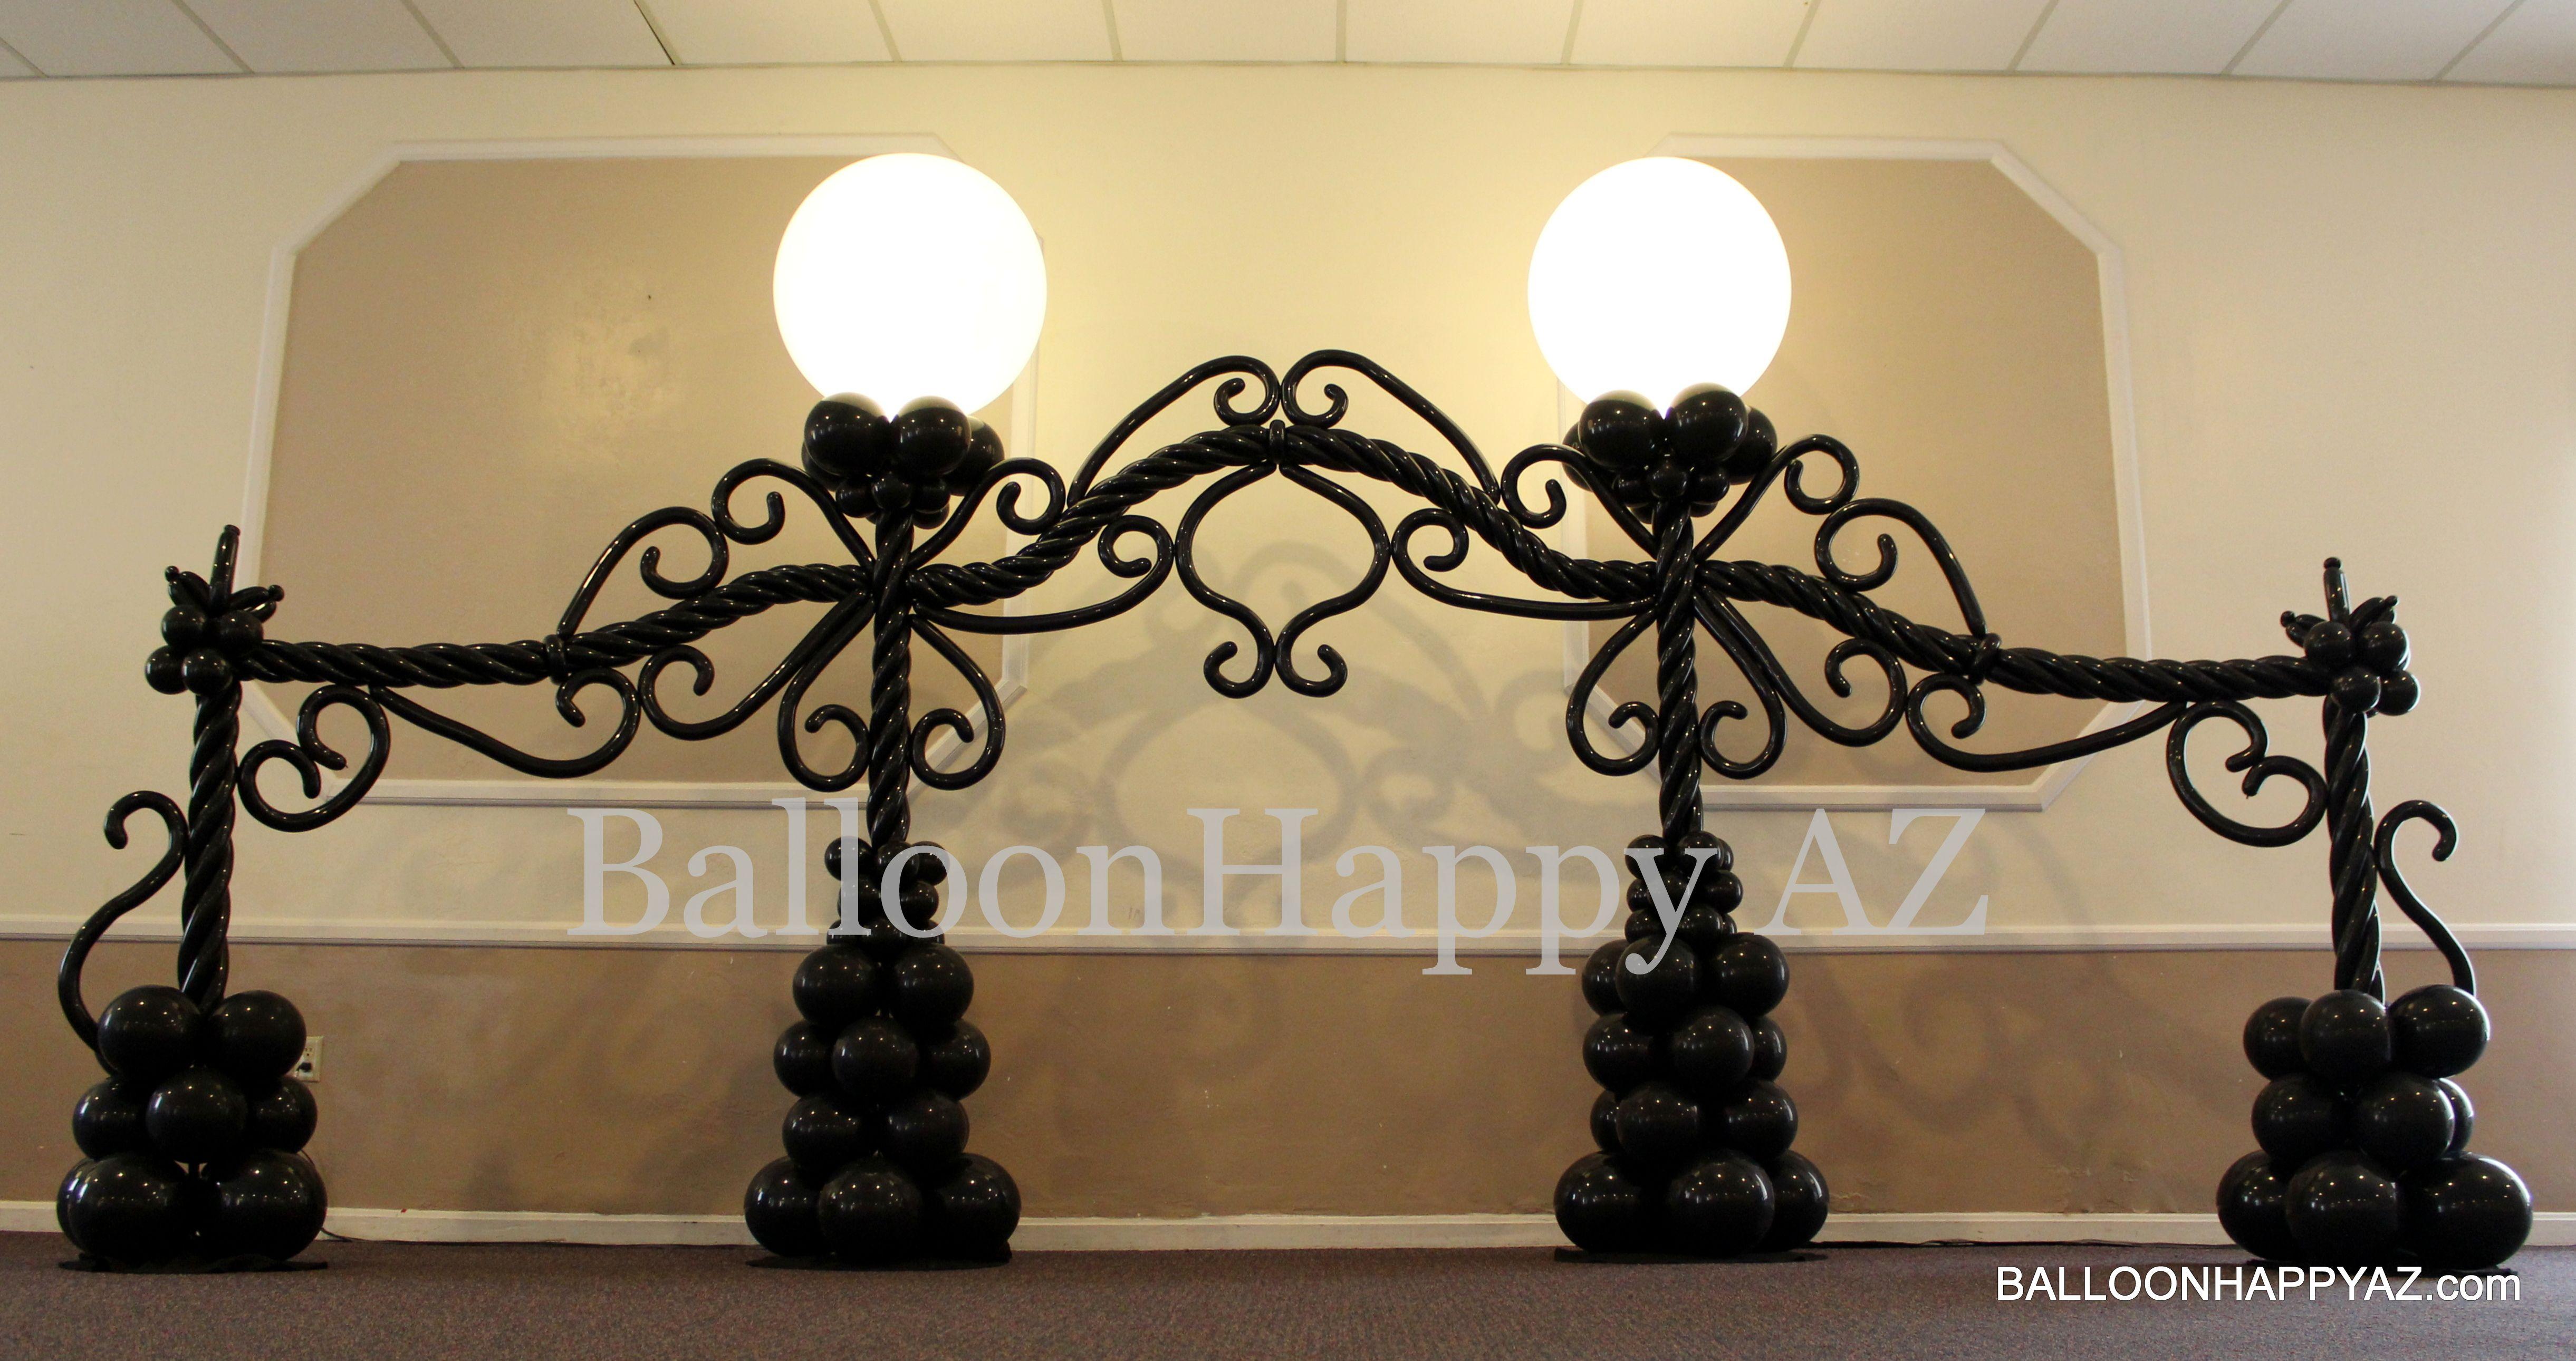 Wedding decoration ideas with balloons  backdropg   London Theme  Pinterest  Balloon arch